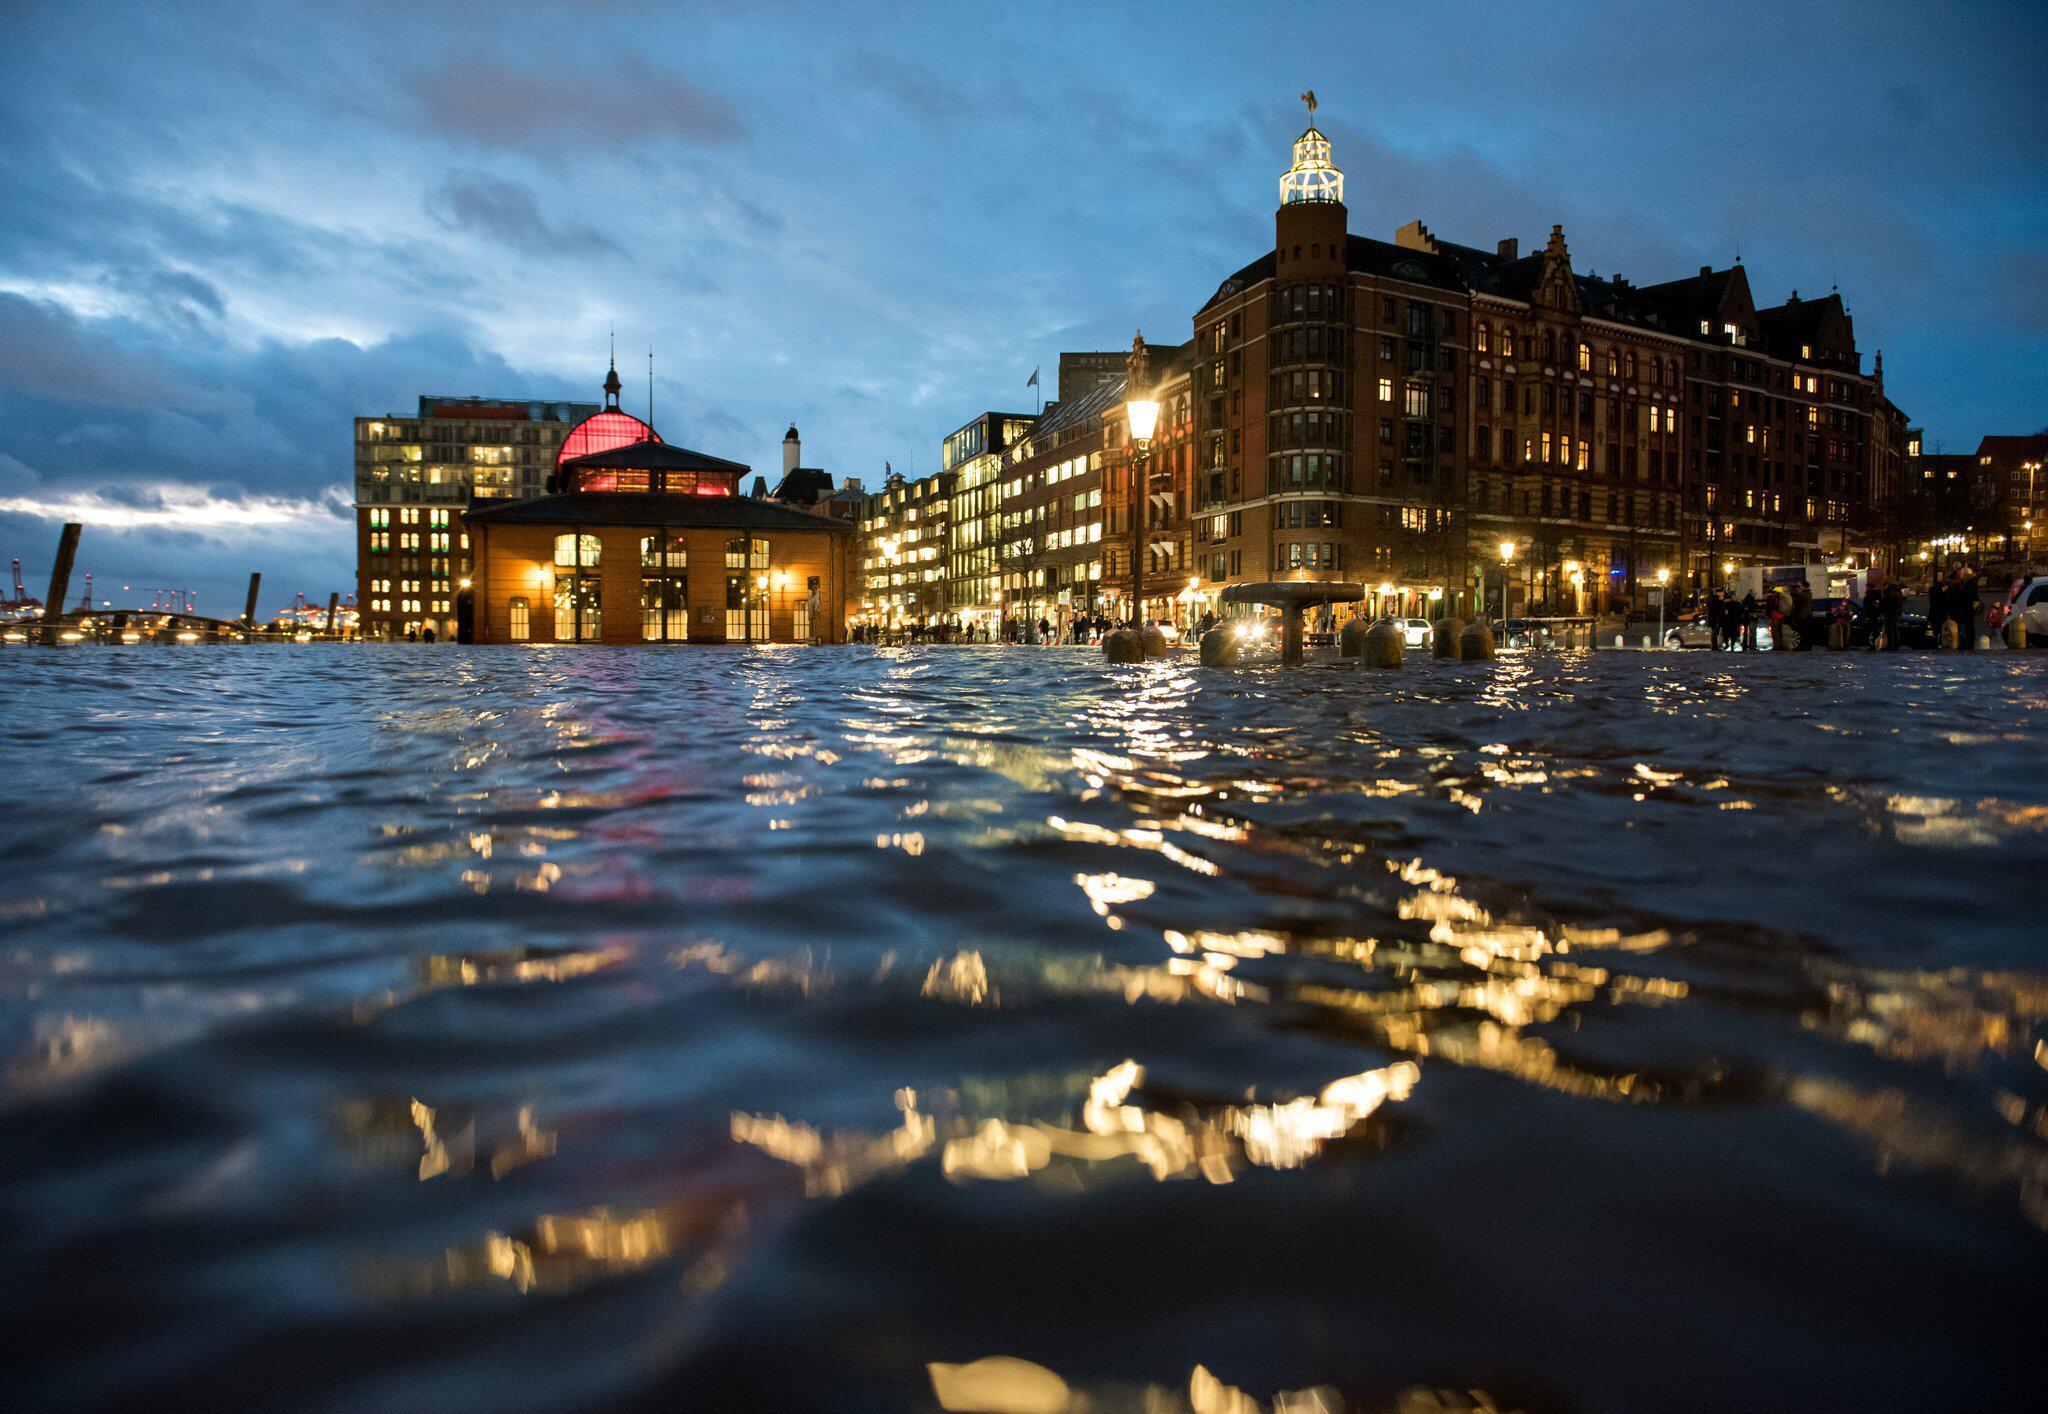 Bild zu Sturmflut in Hamburg